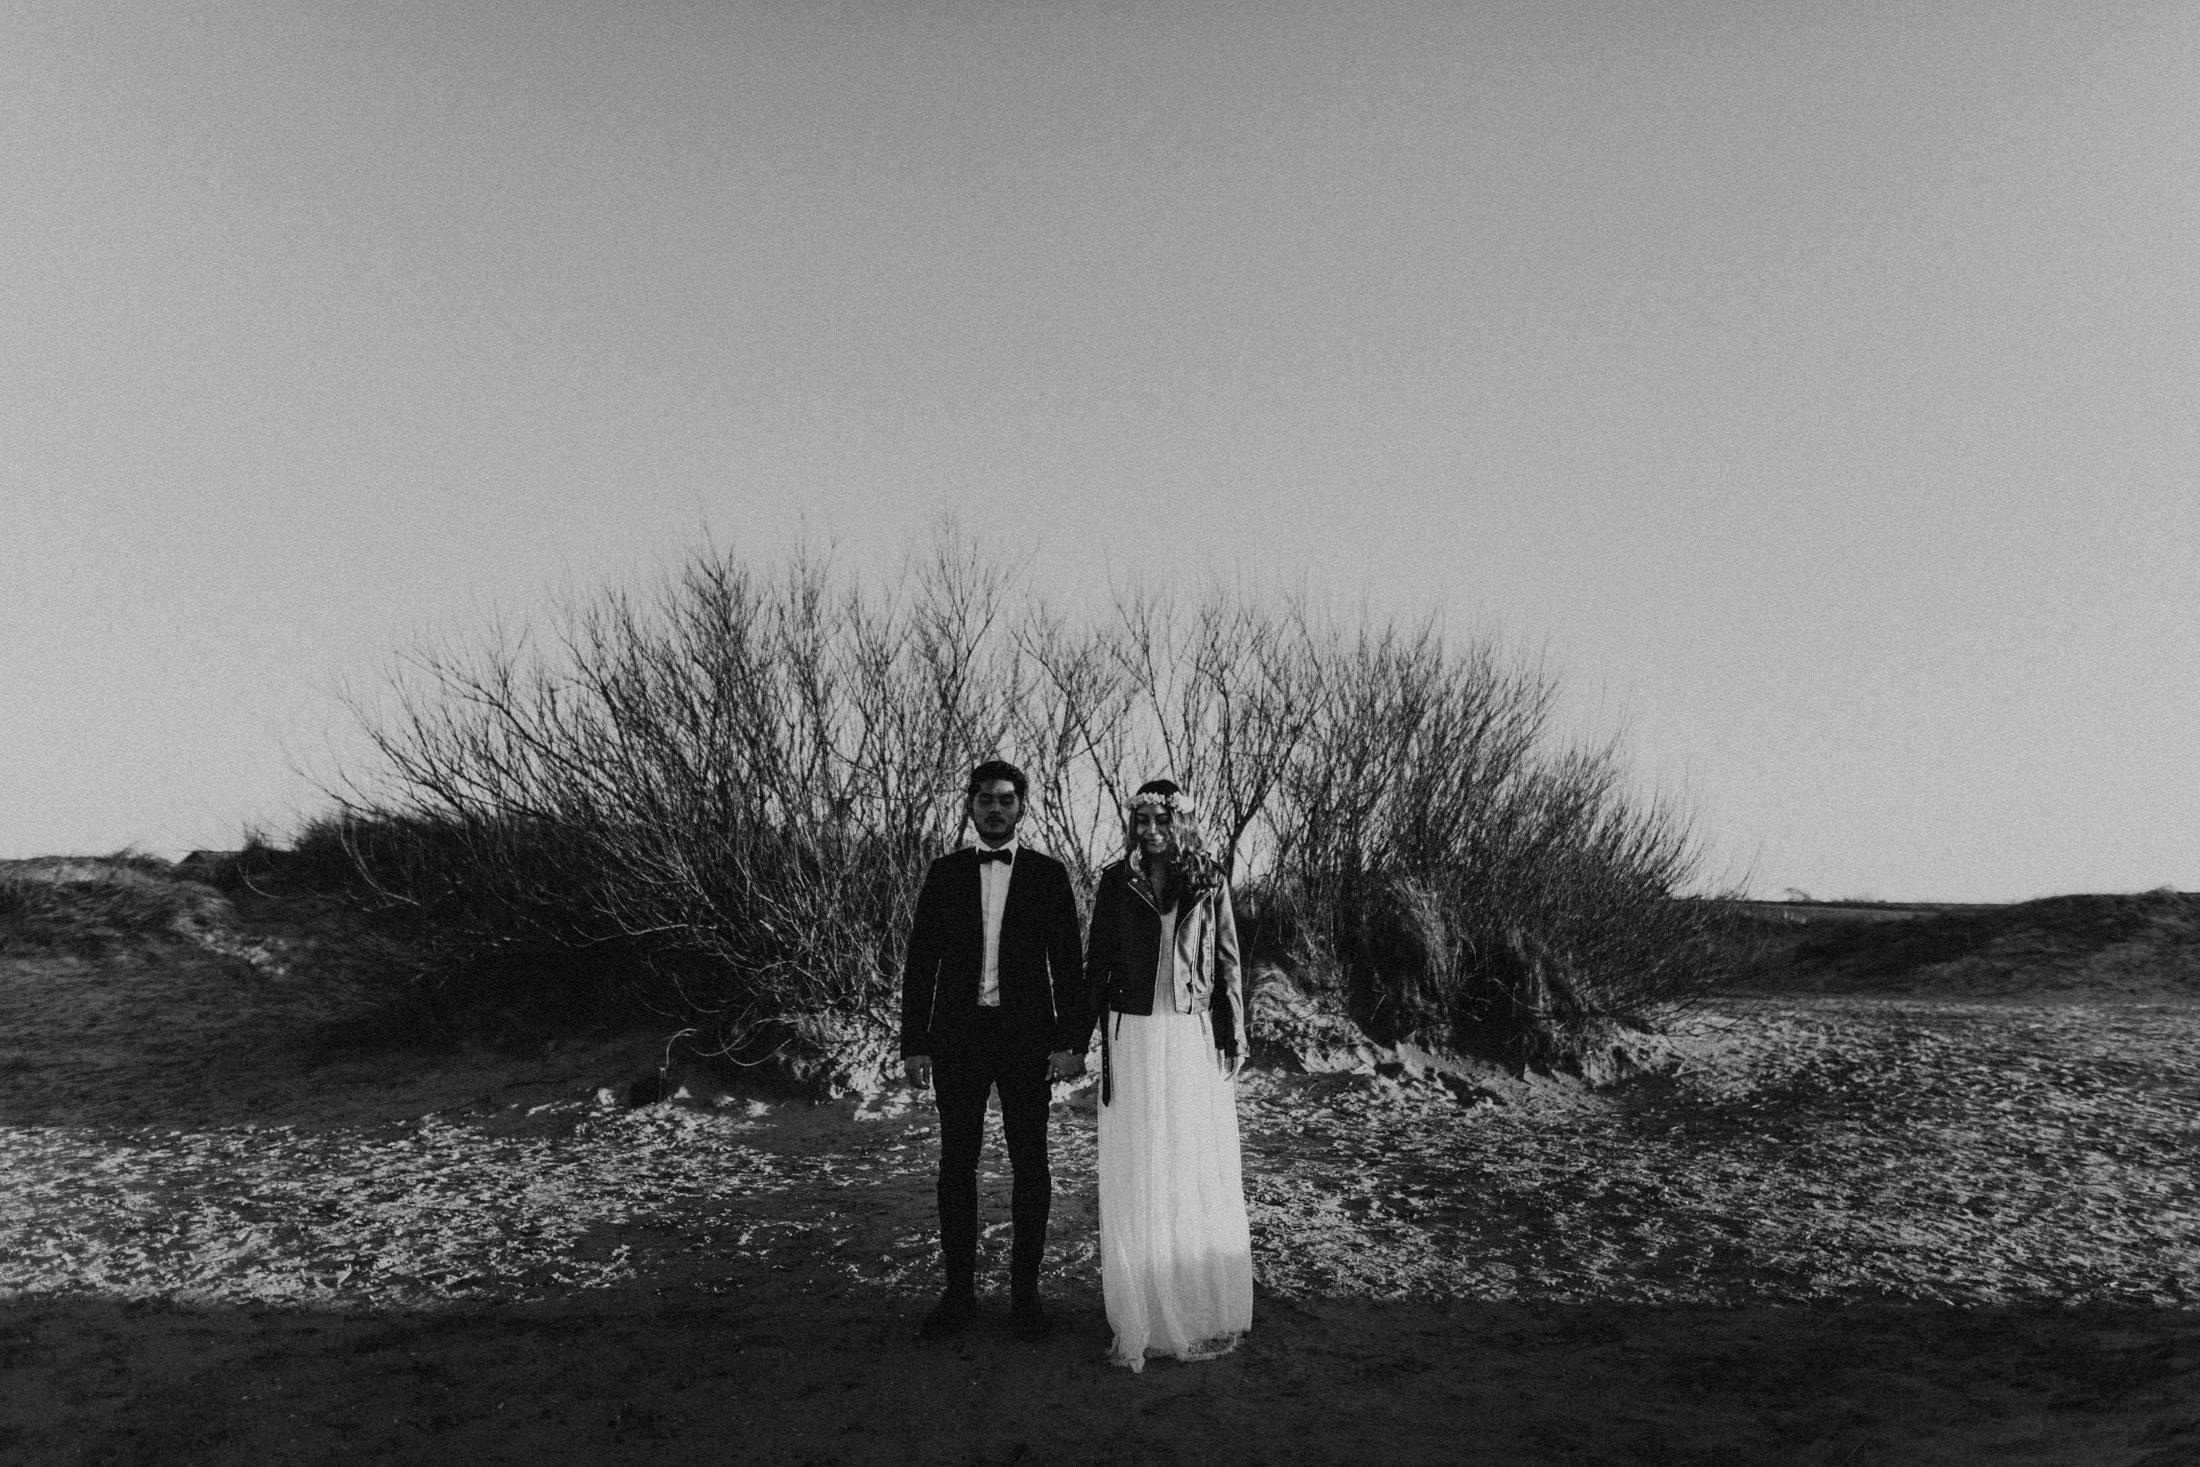 Wedding_Photographer_Mallorca_Daniela-Marquardt_Photography_CanaryIslands_Lanzarote_Iceland_Tuskany_Santorini_Portugal_Schweiz_Austria_Bayern_Elopement_Hochzeitsfotograf_Norddeichich_1